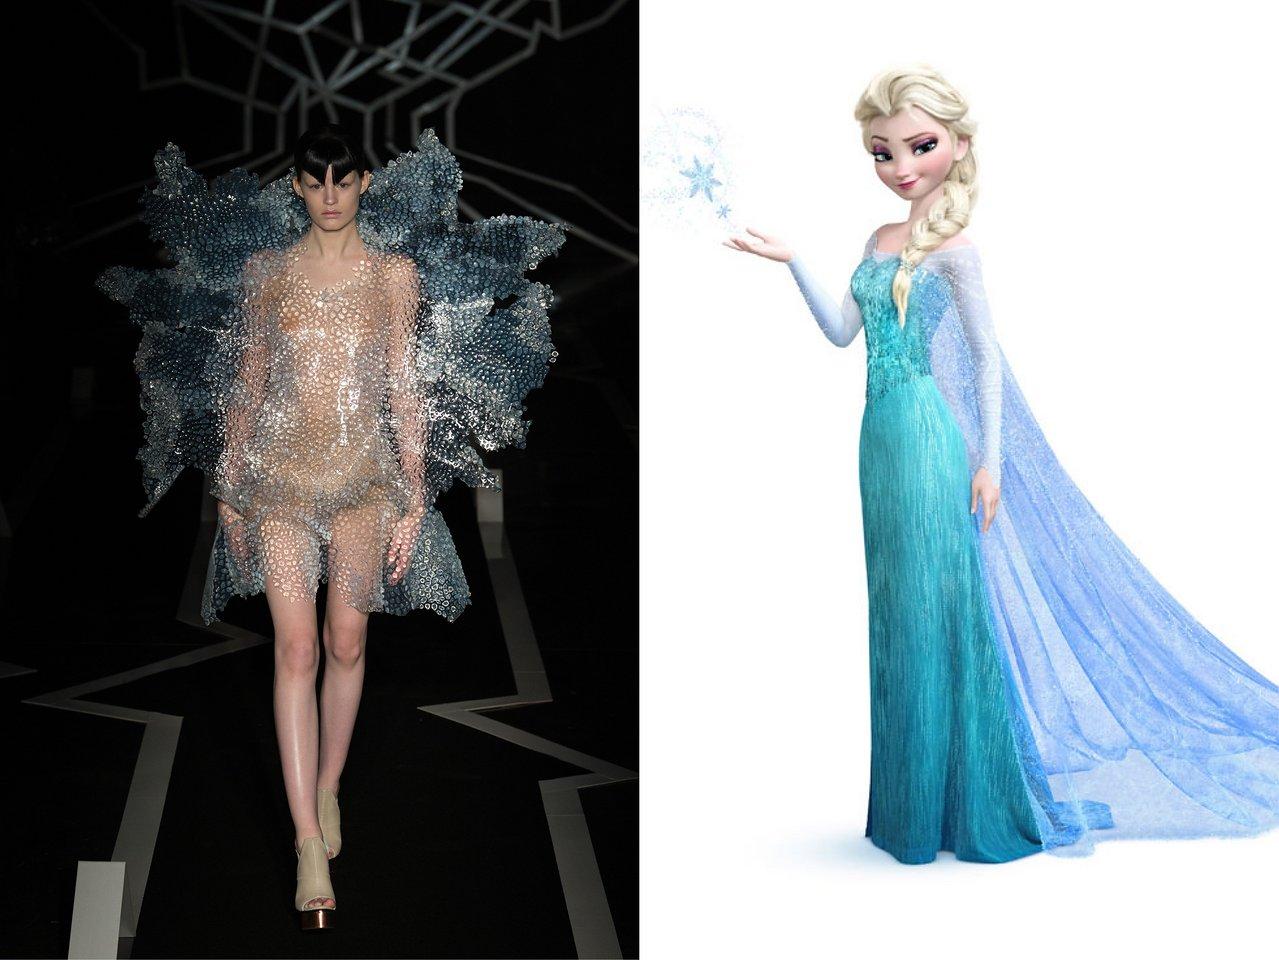 Photo taken from (left photo) Indigital.tv; Photo: Courtesy of Walt Disney Pictures